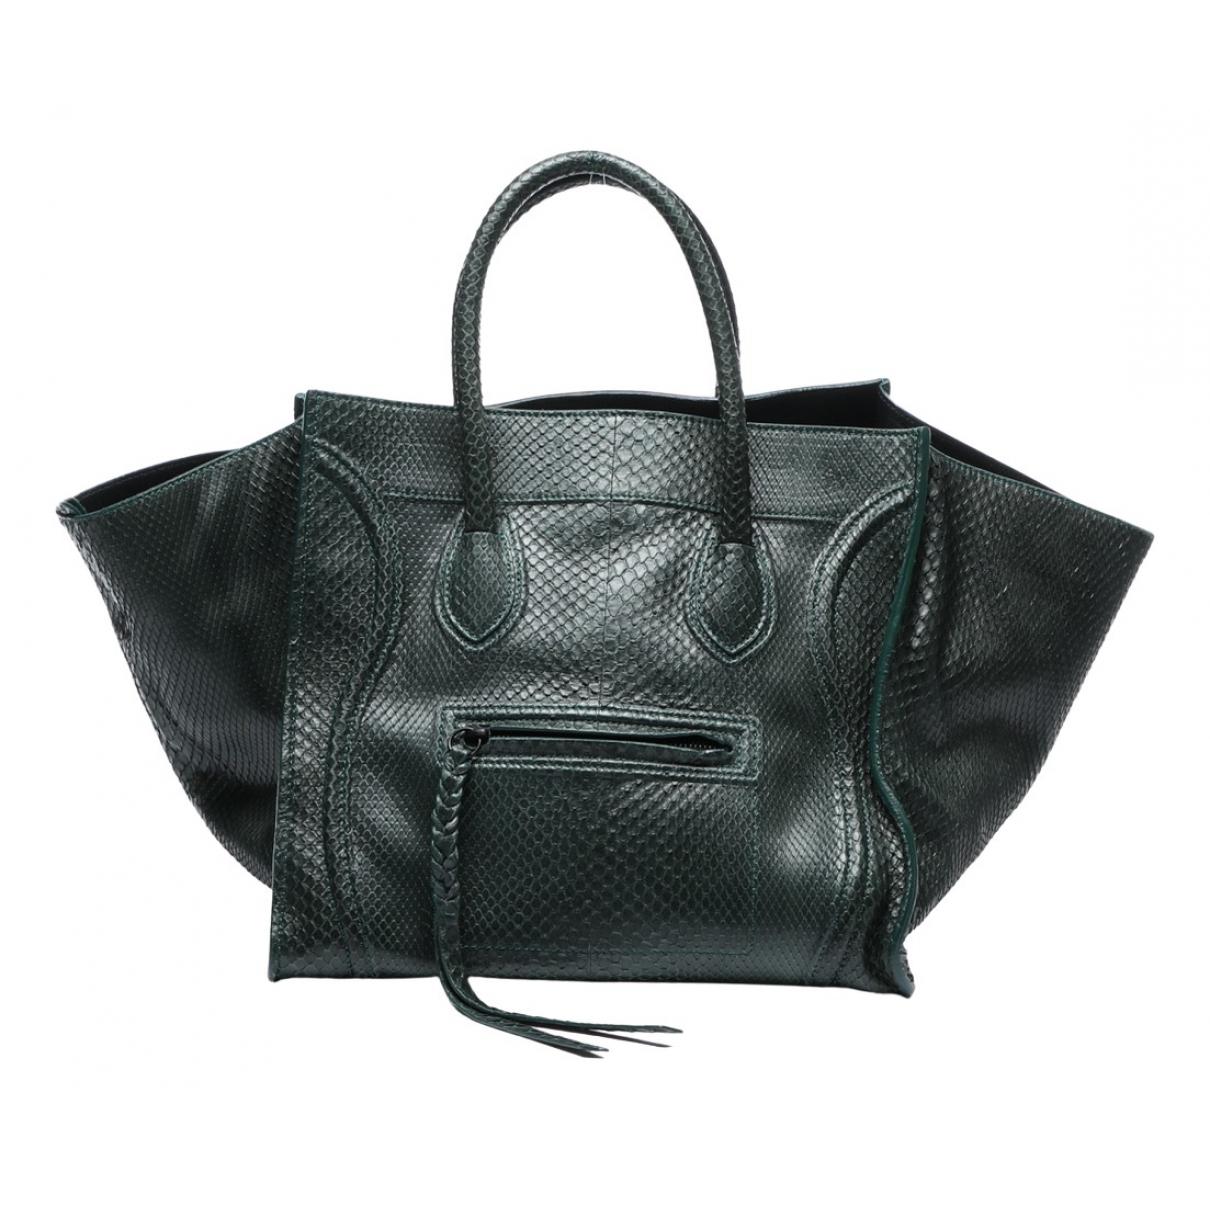 Celine Luggage Phantom Handtasche in  Gruen Exotenleder